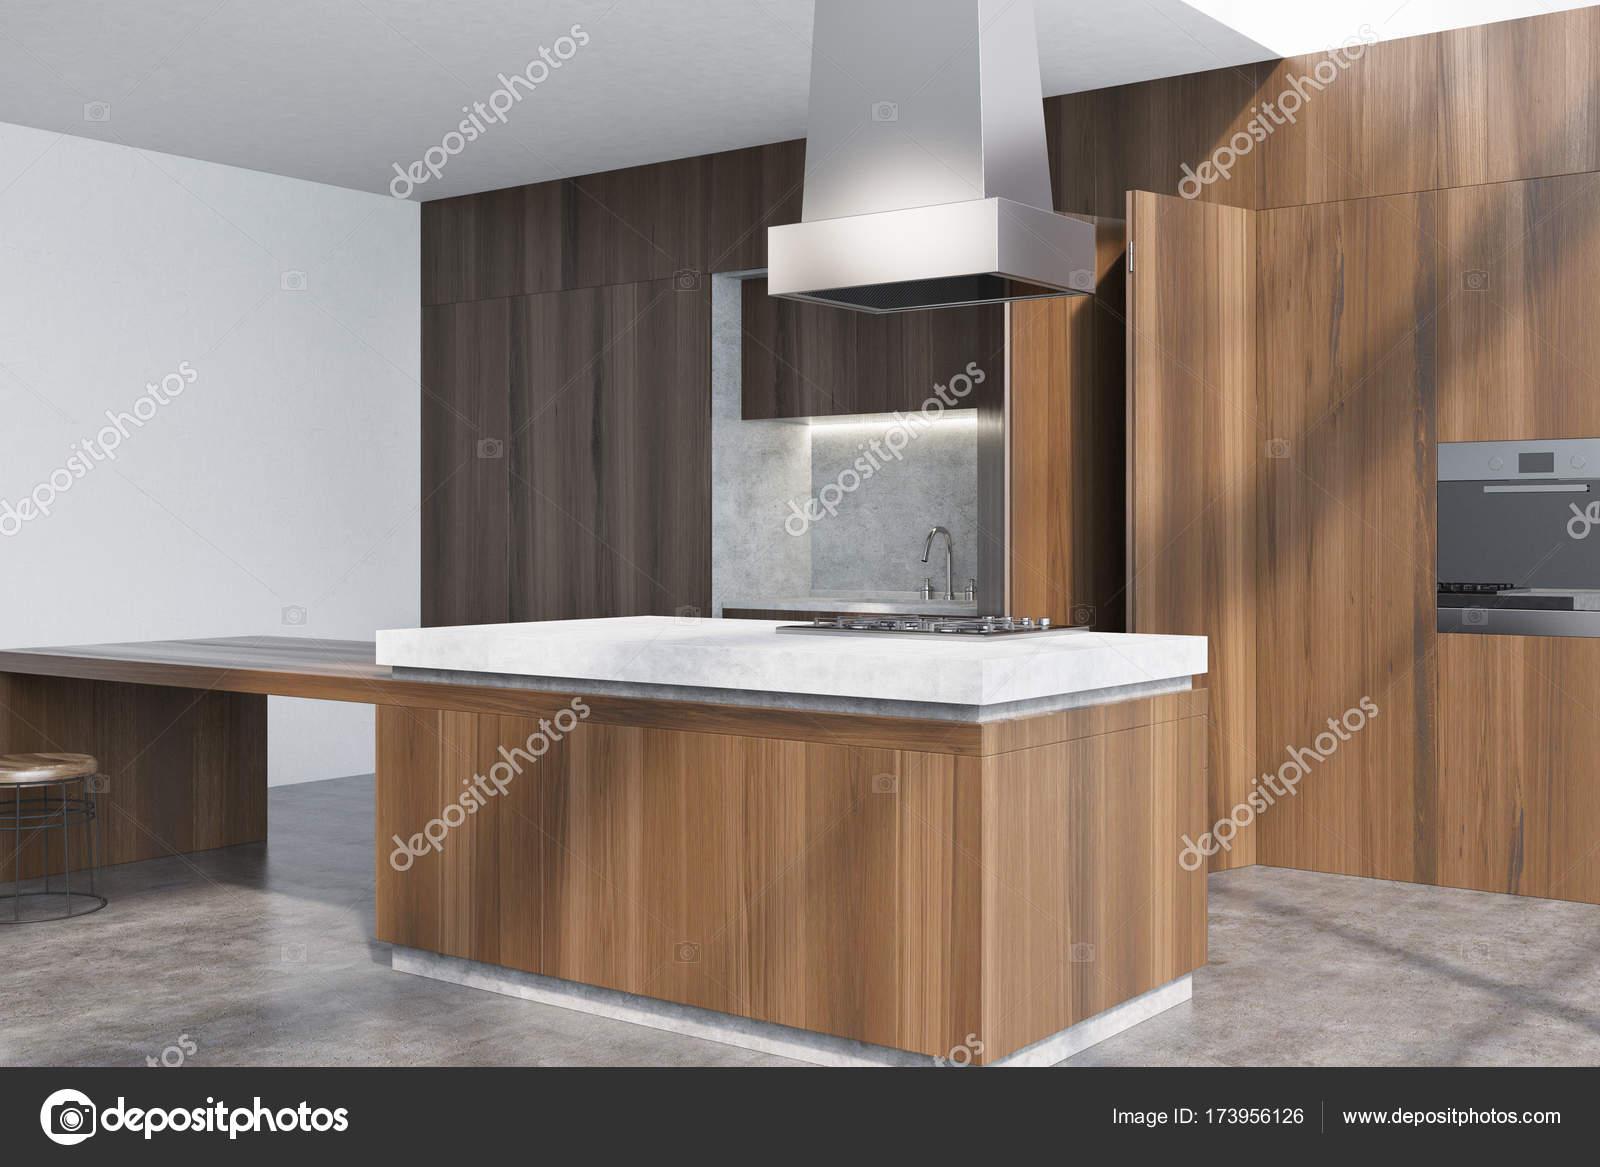 Cocina de madera oscura, en la esquina — Foto de stock ...